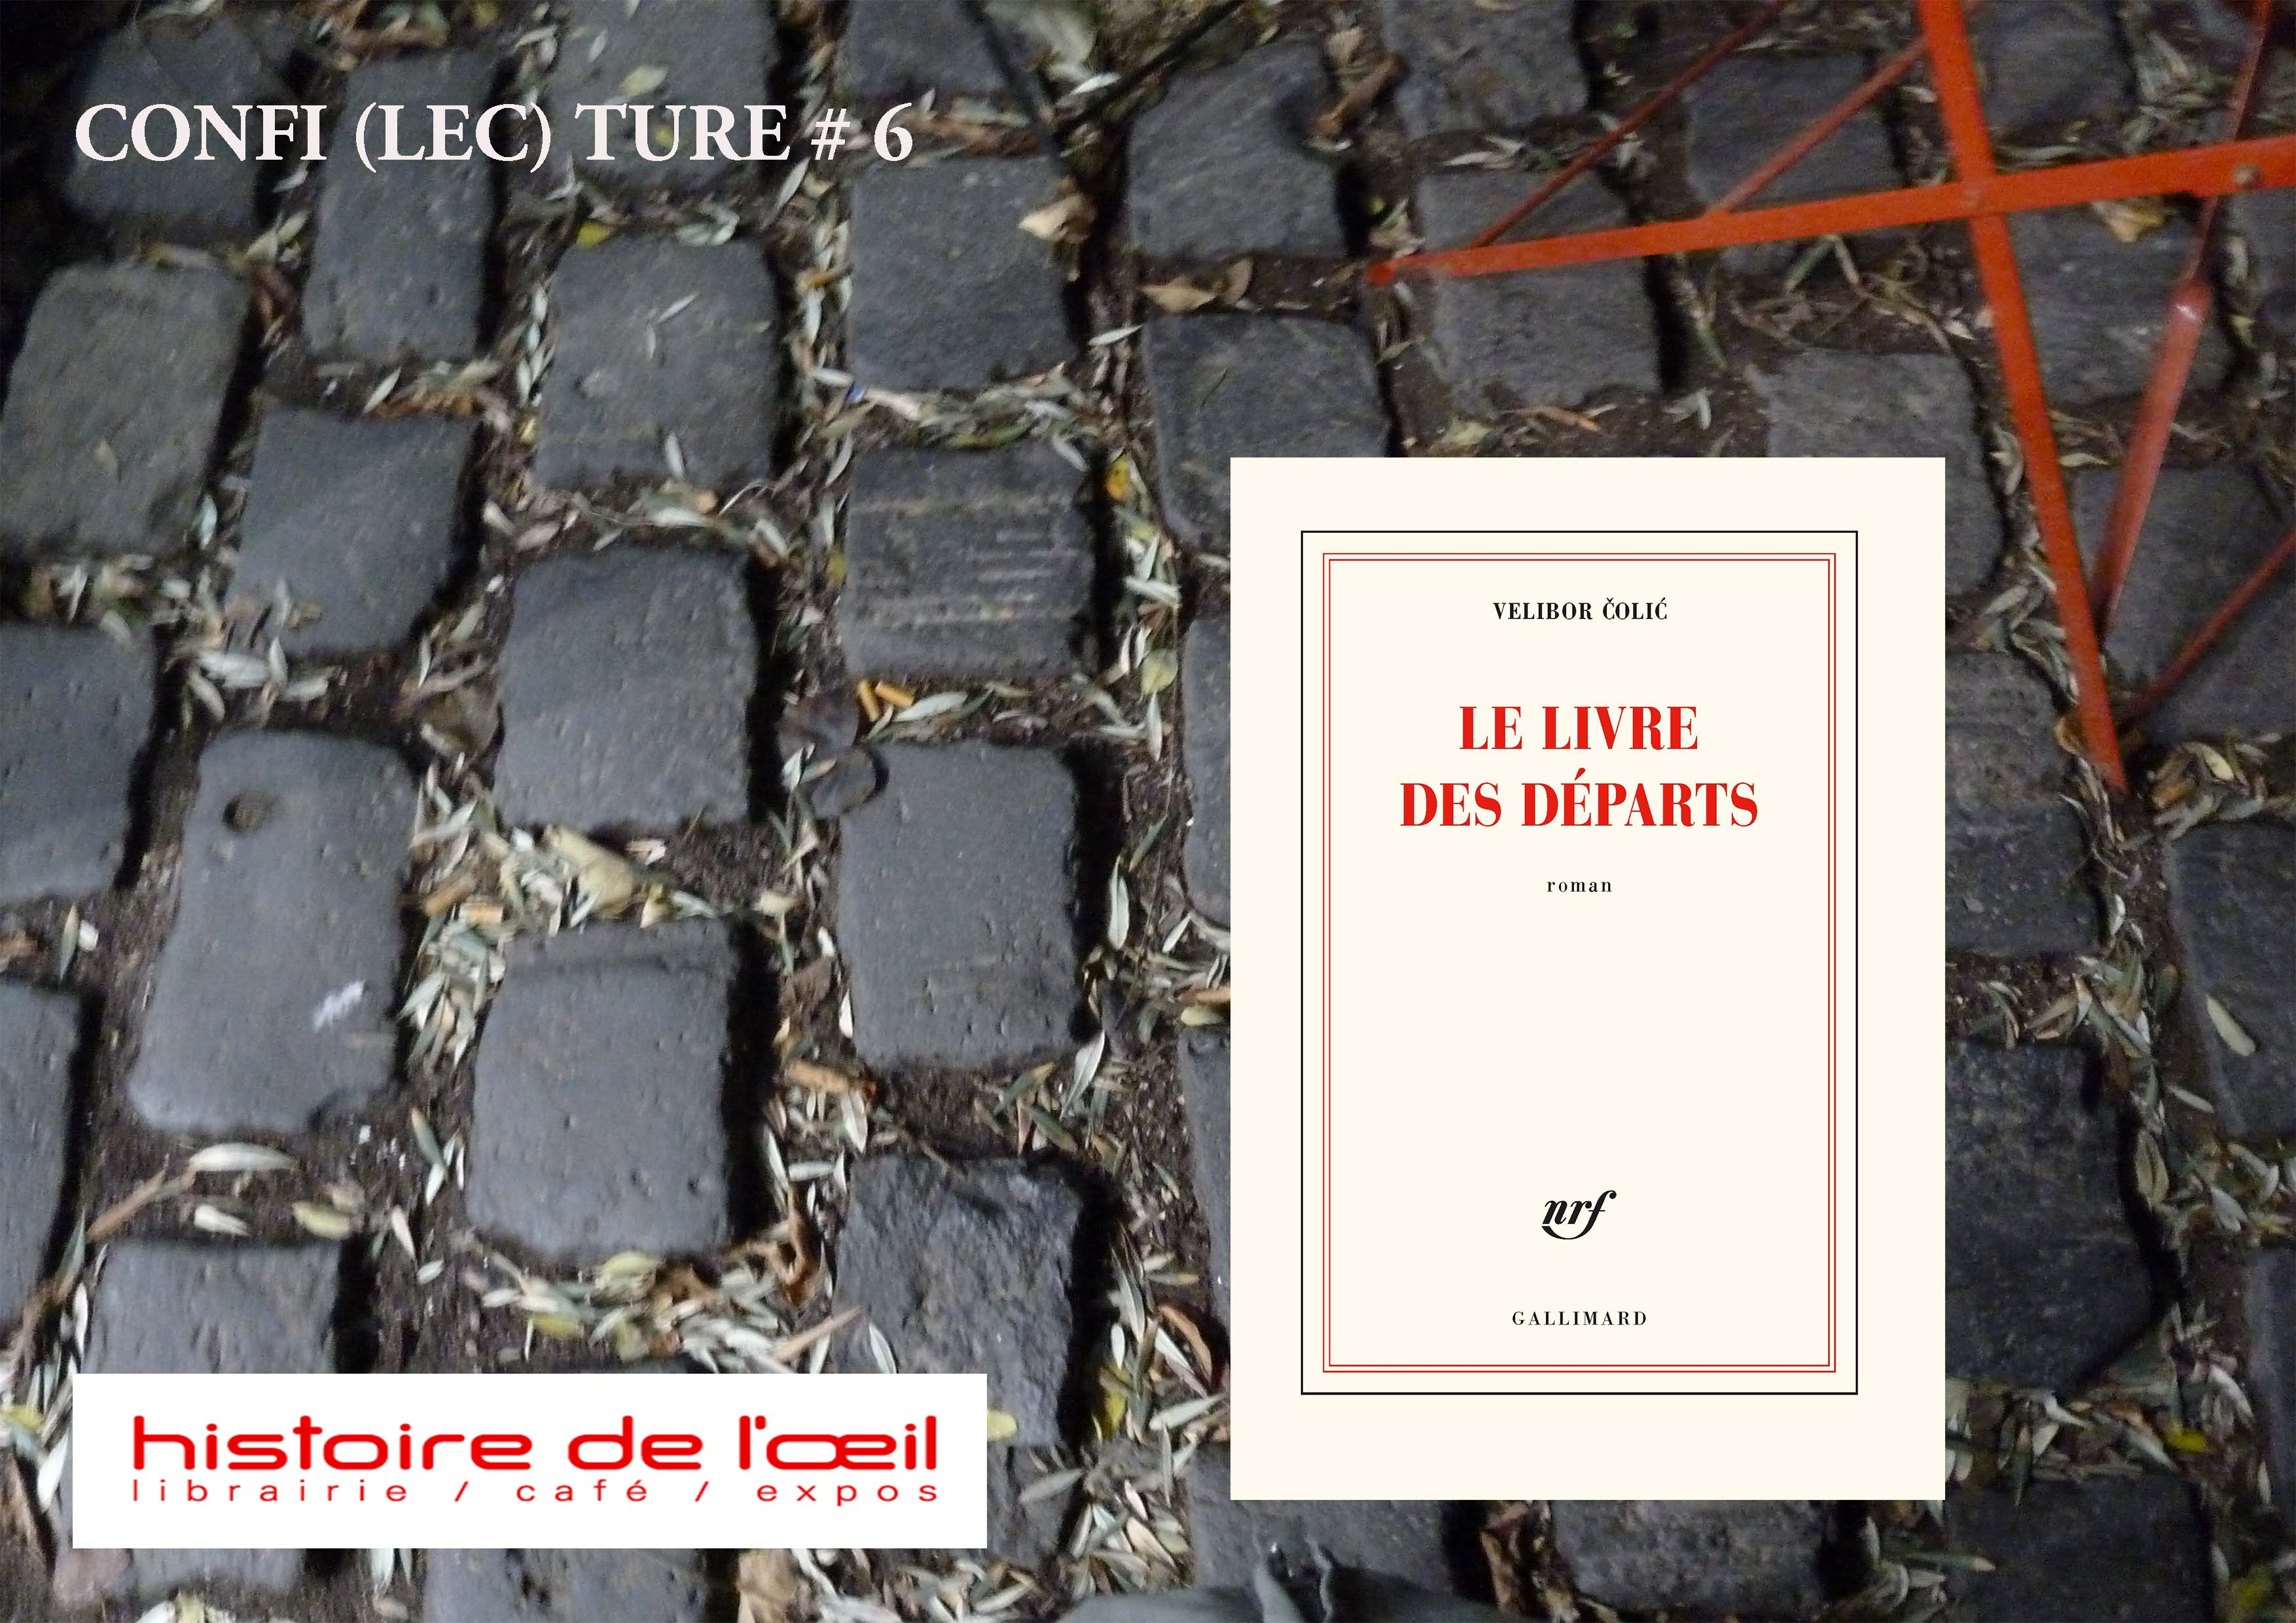 https://www.histoiredeloeil.com/sites/default/files/imagetitreconfilecturecolic.jpg